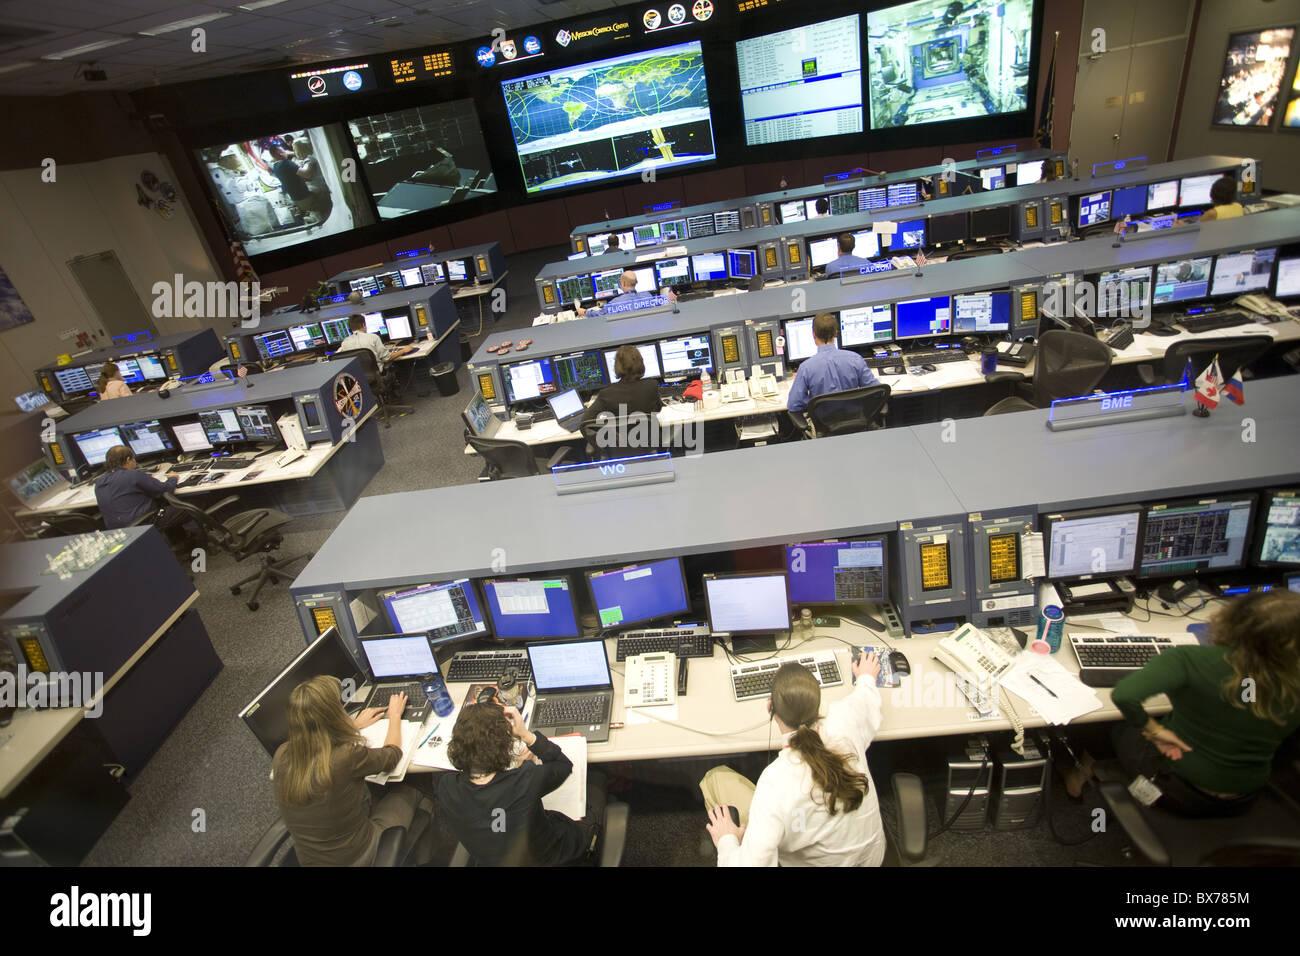 NASA Mission Control, Houston, Texas, United States of America, North America - Stock Image